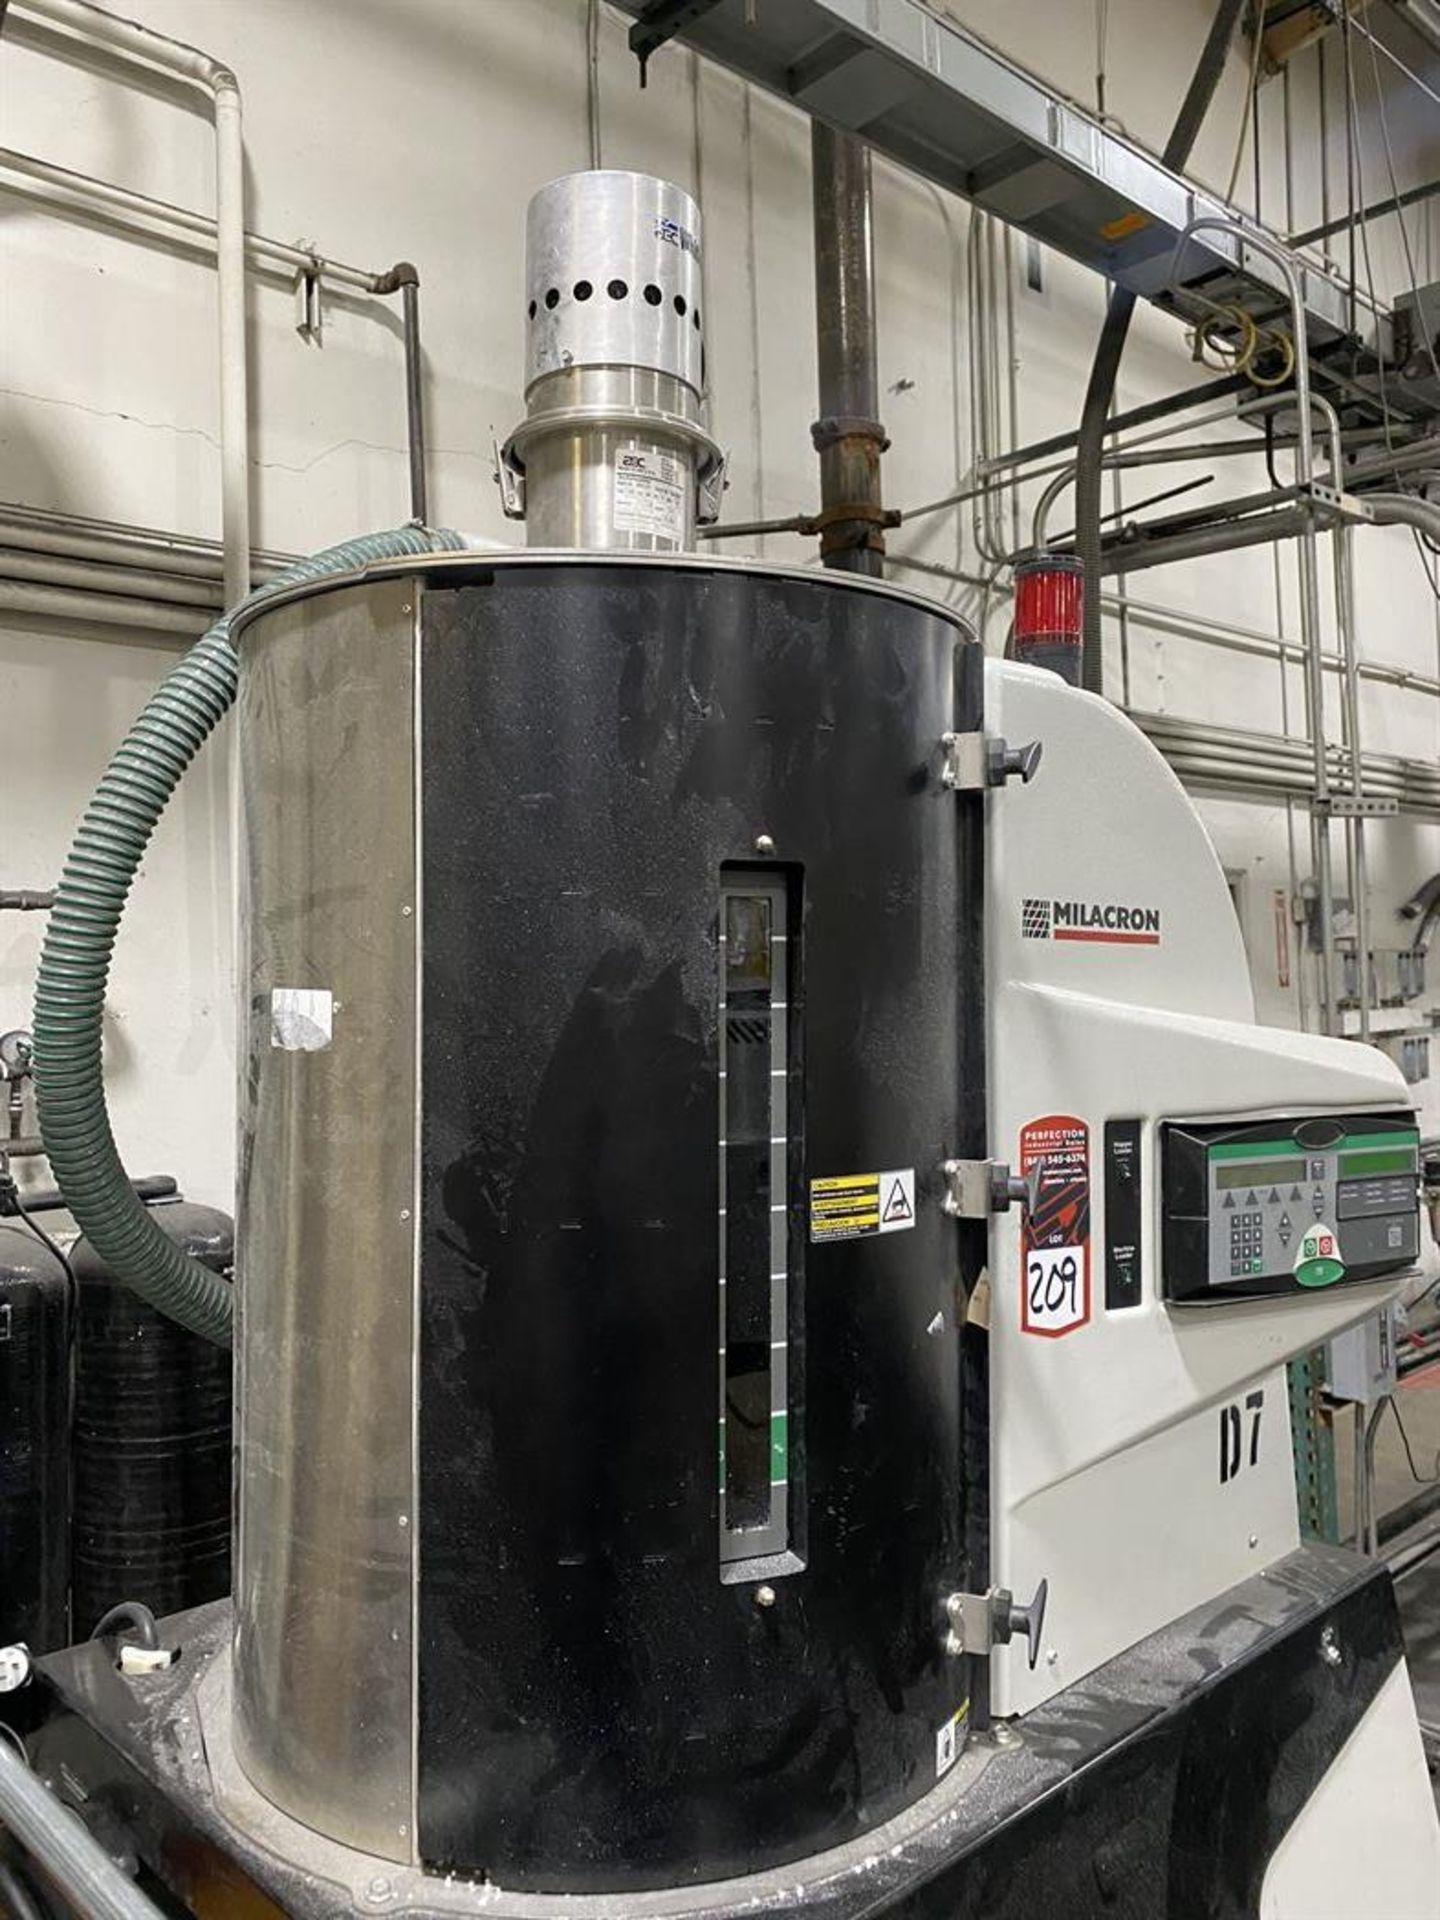 Lot 209 - Cincinnati Milacron MDCW75 Hopper Dryer System, s/n na, w/ Vacuum Loader